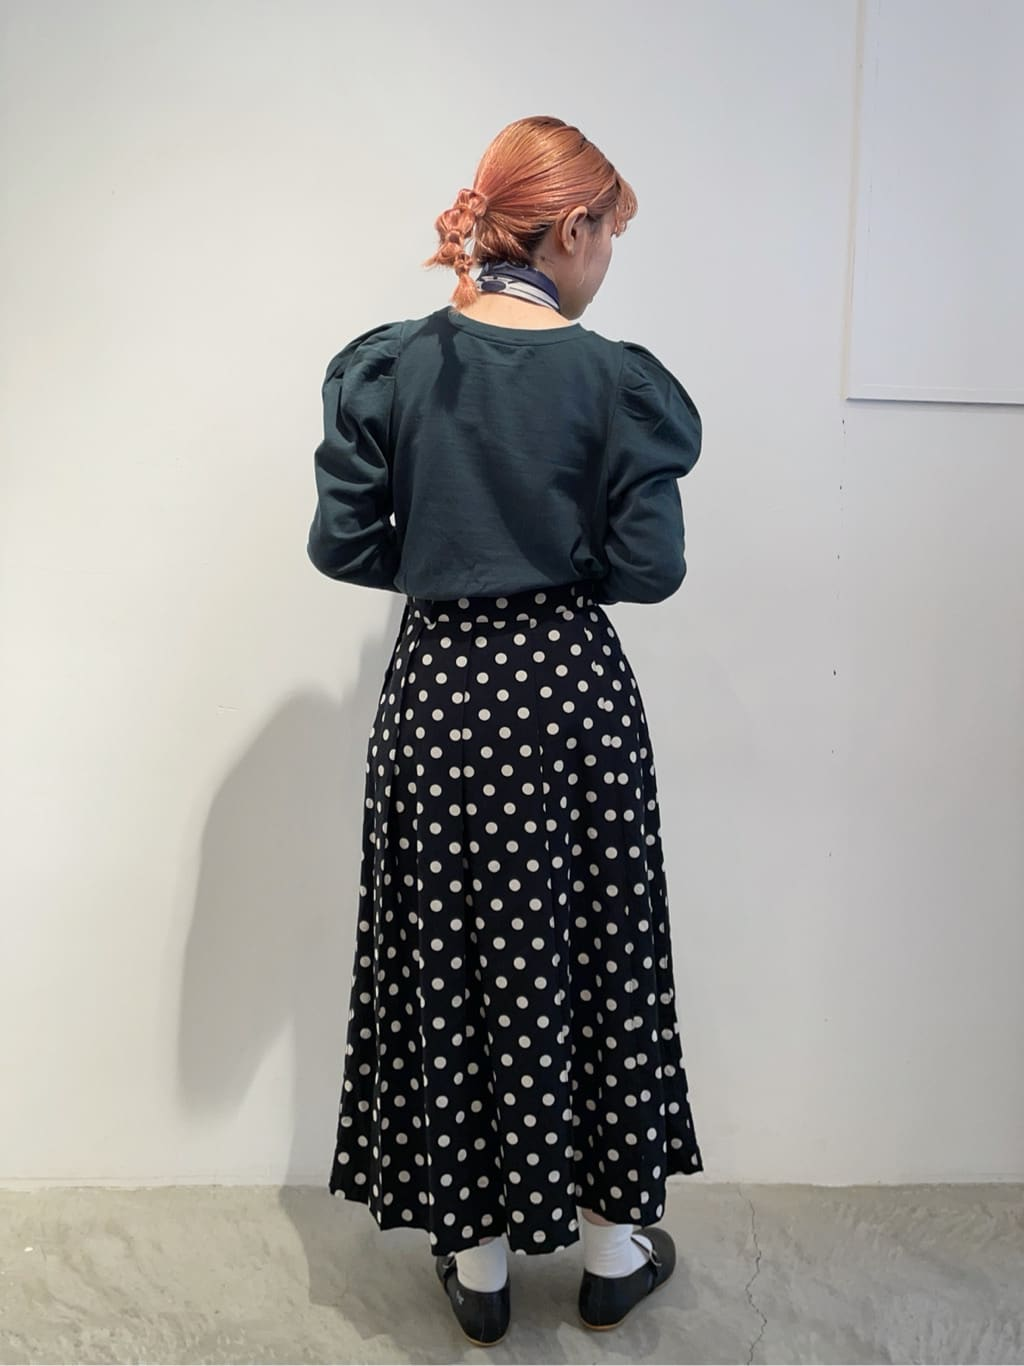 - CHILD WOMAN 原宿路面 身長:160cm 2021.08.31